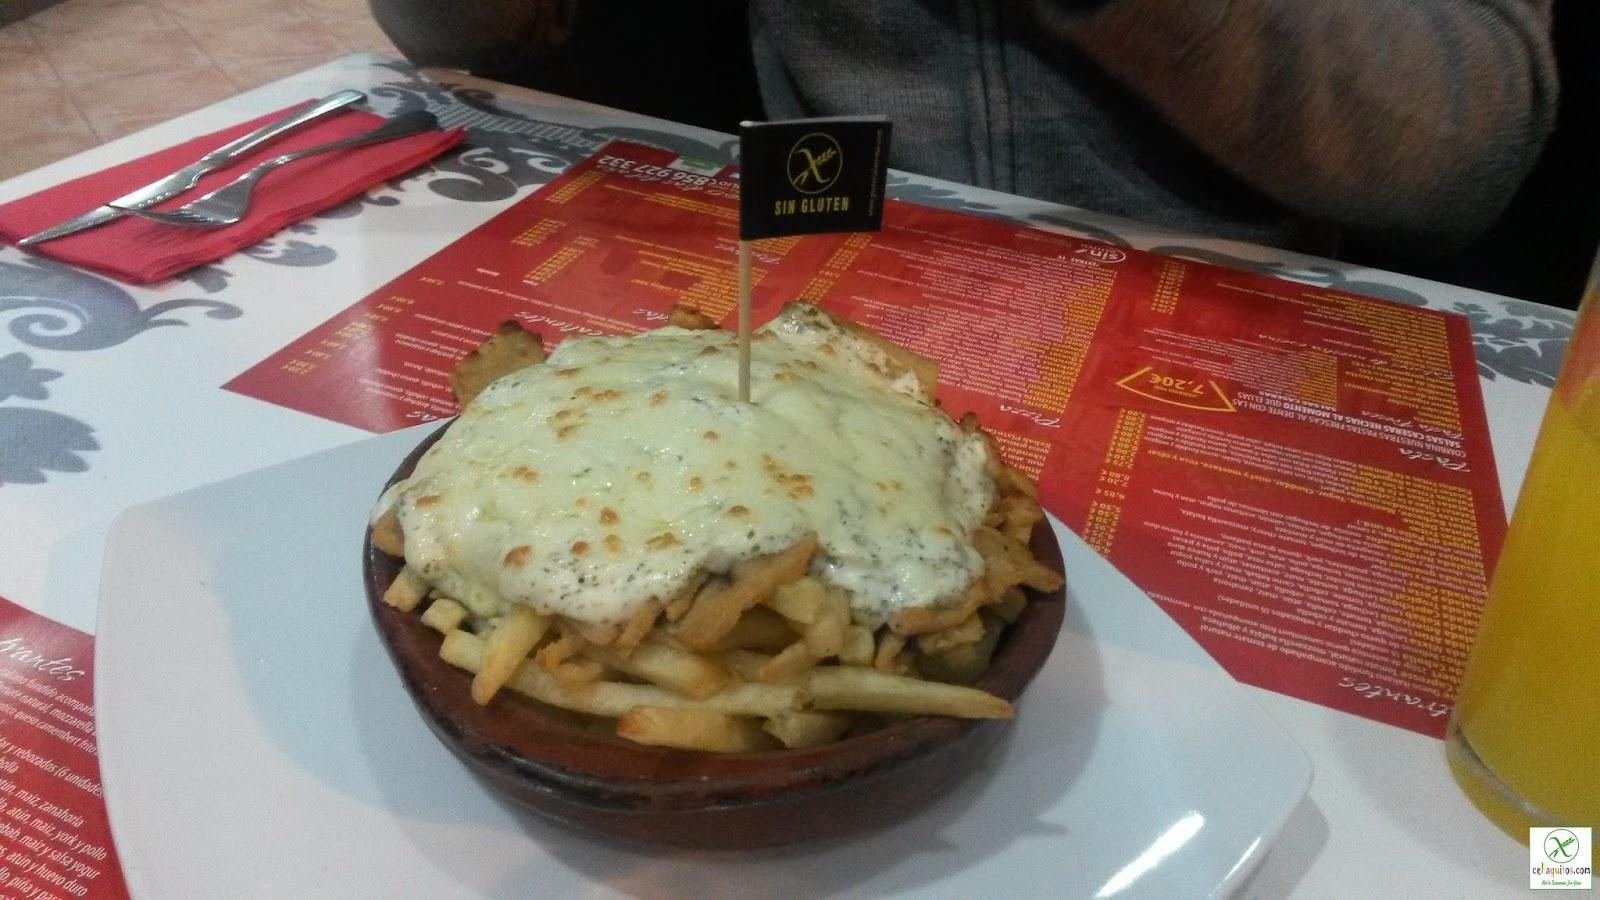 Blog de pizzeria roma jerez cuando las cosas se hacen con cari o - Pizzeria con giardino roma ...